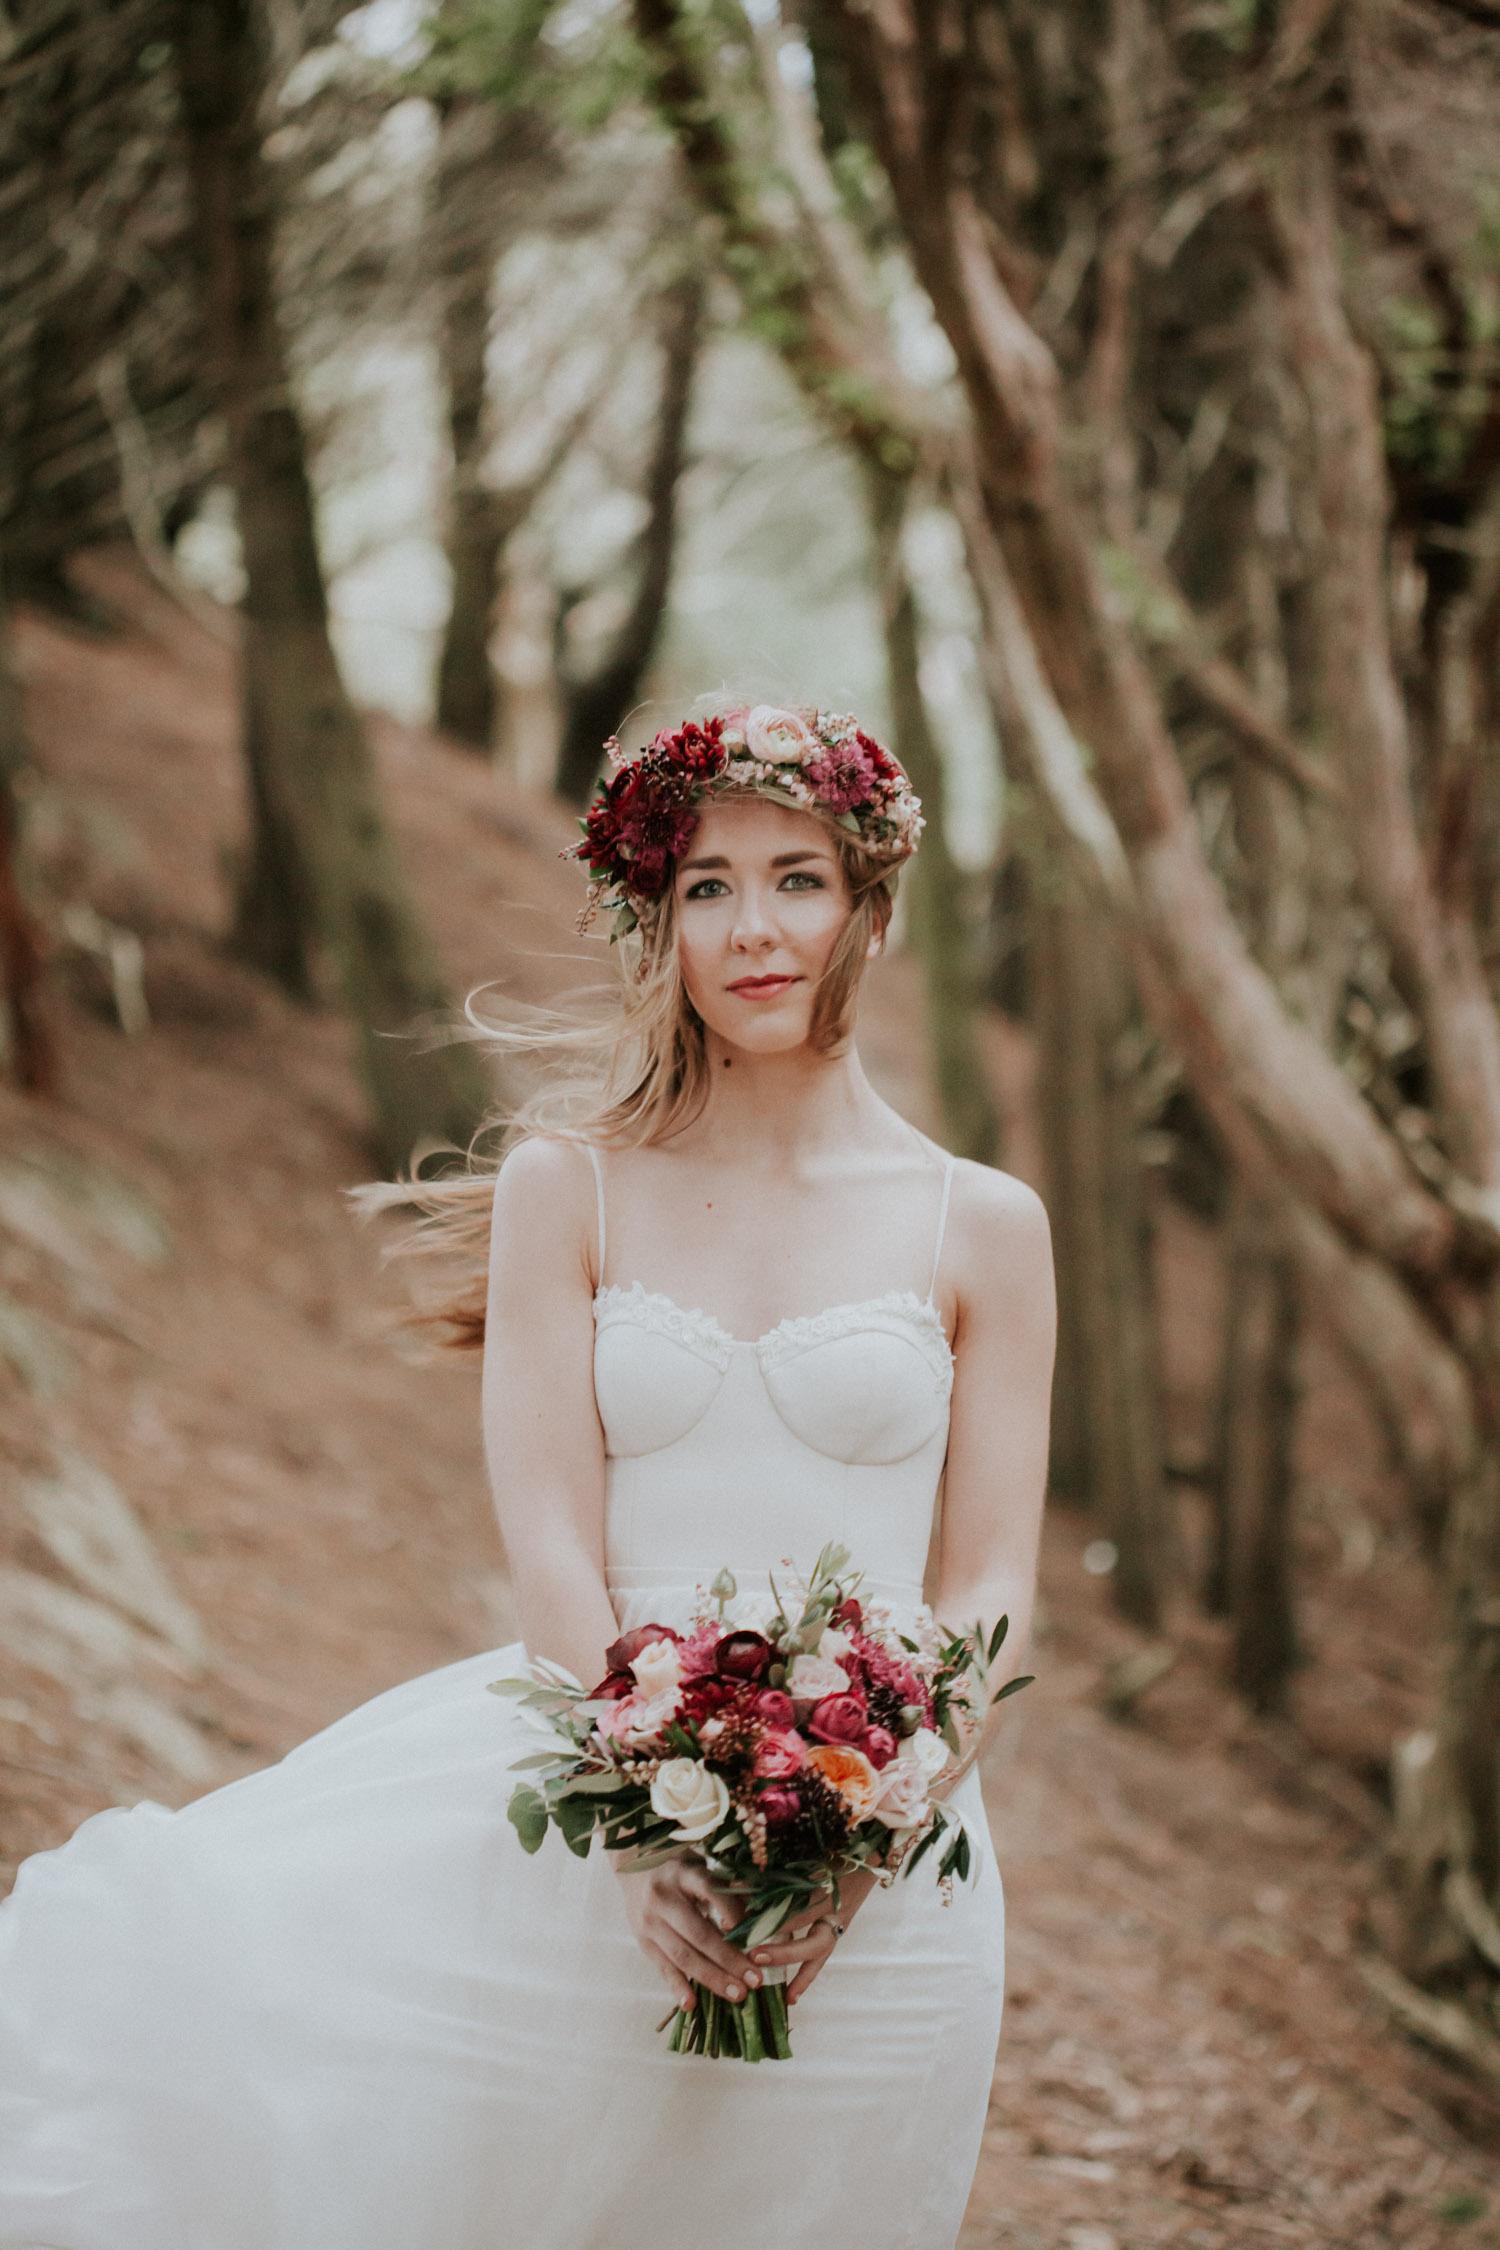 Bride holding a Melissa Jane Flower Studio bouquet.